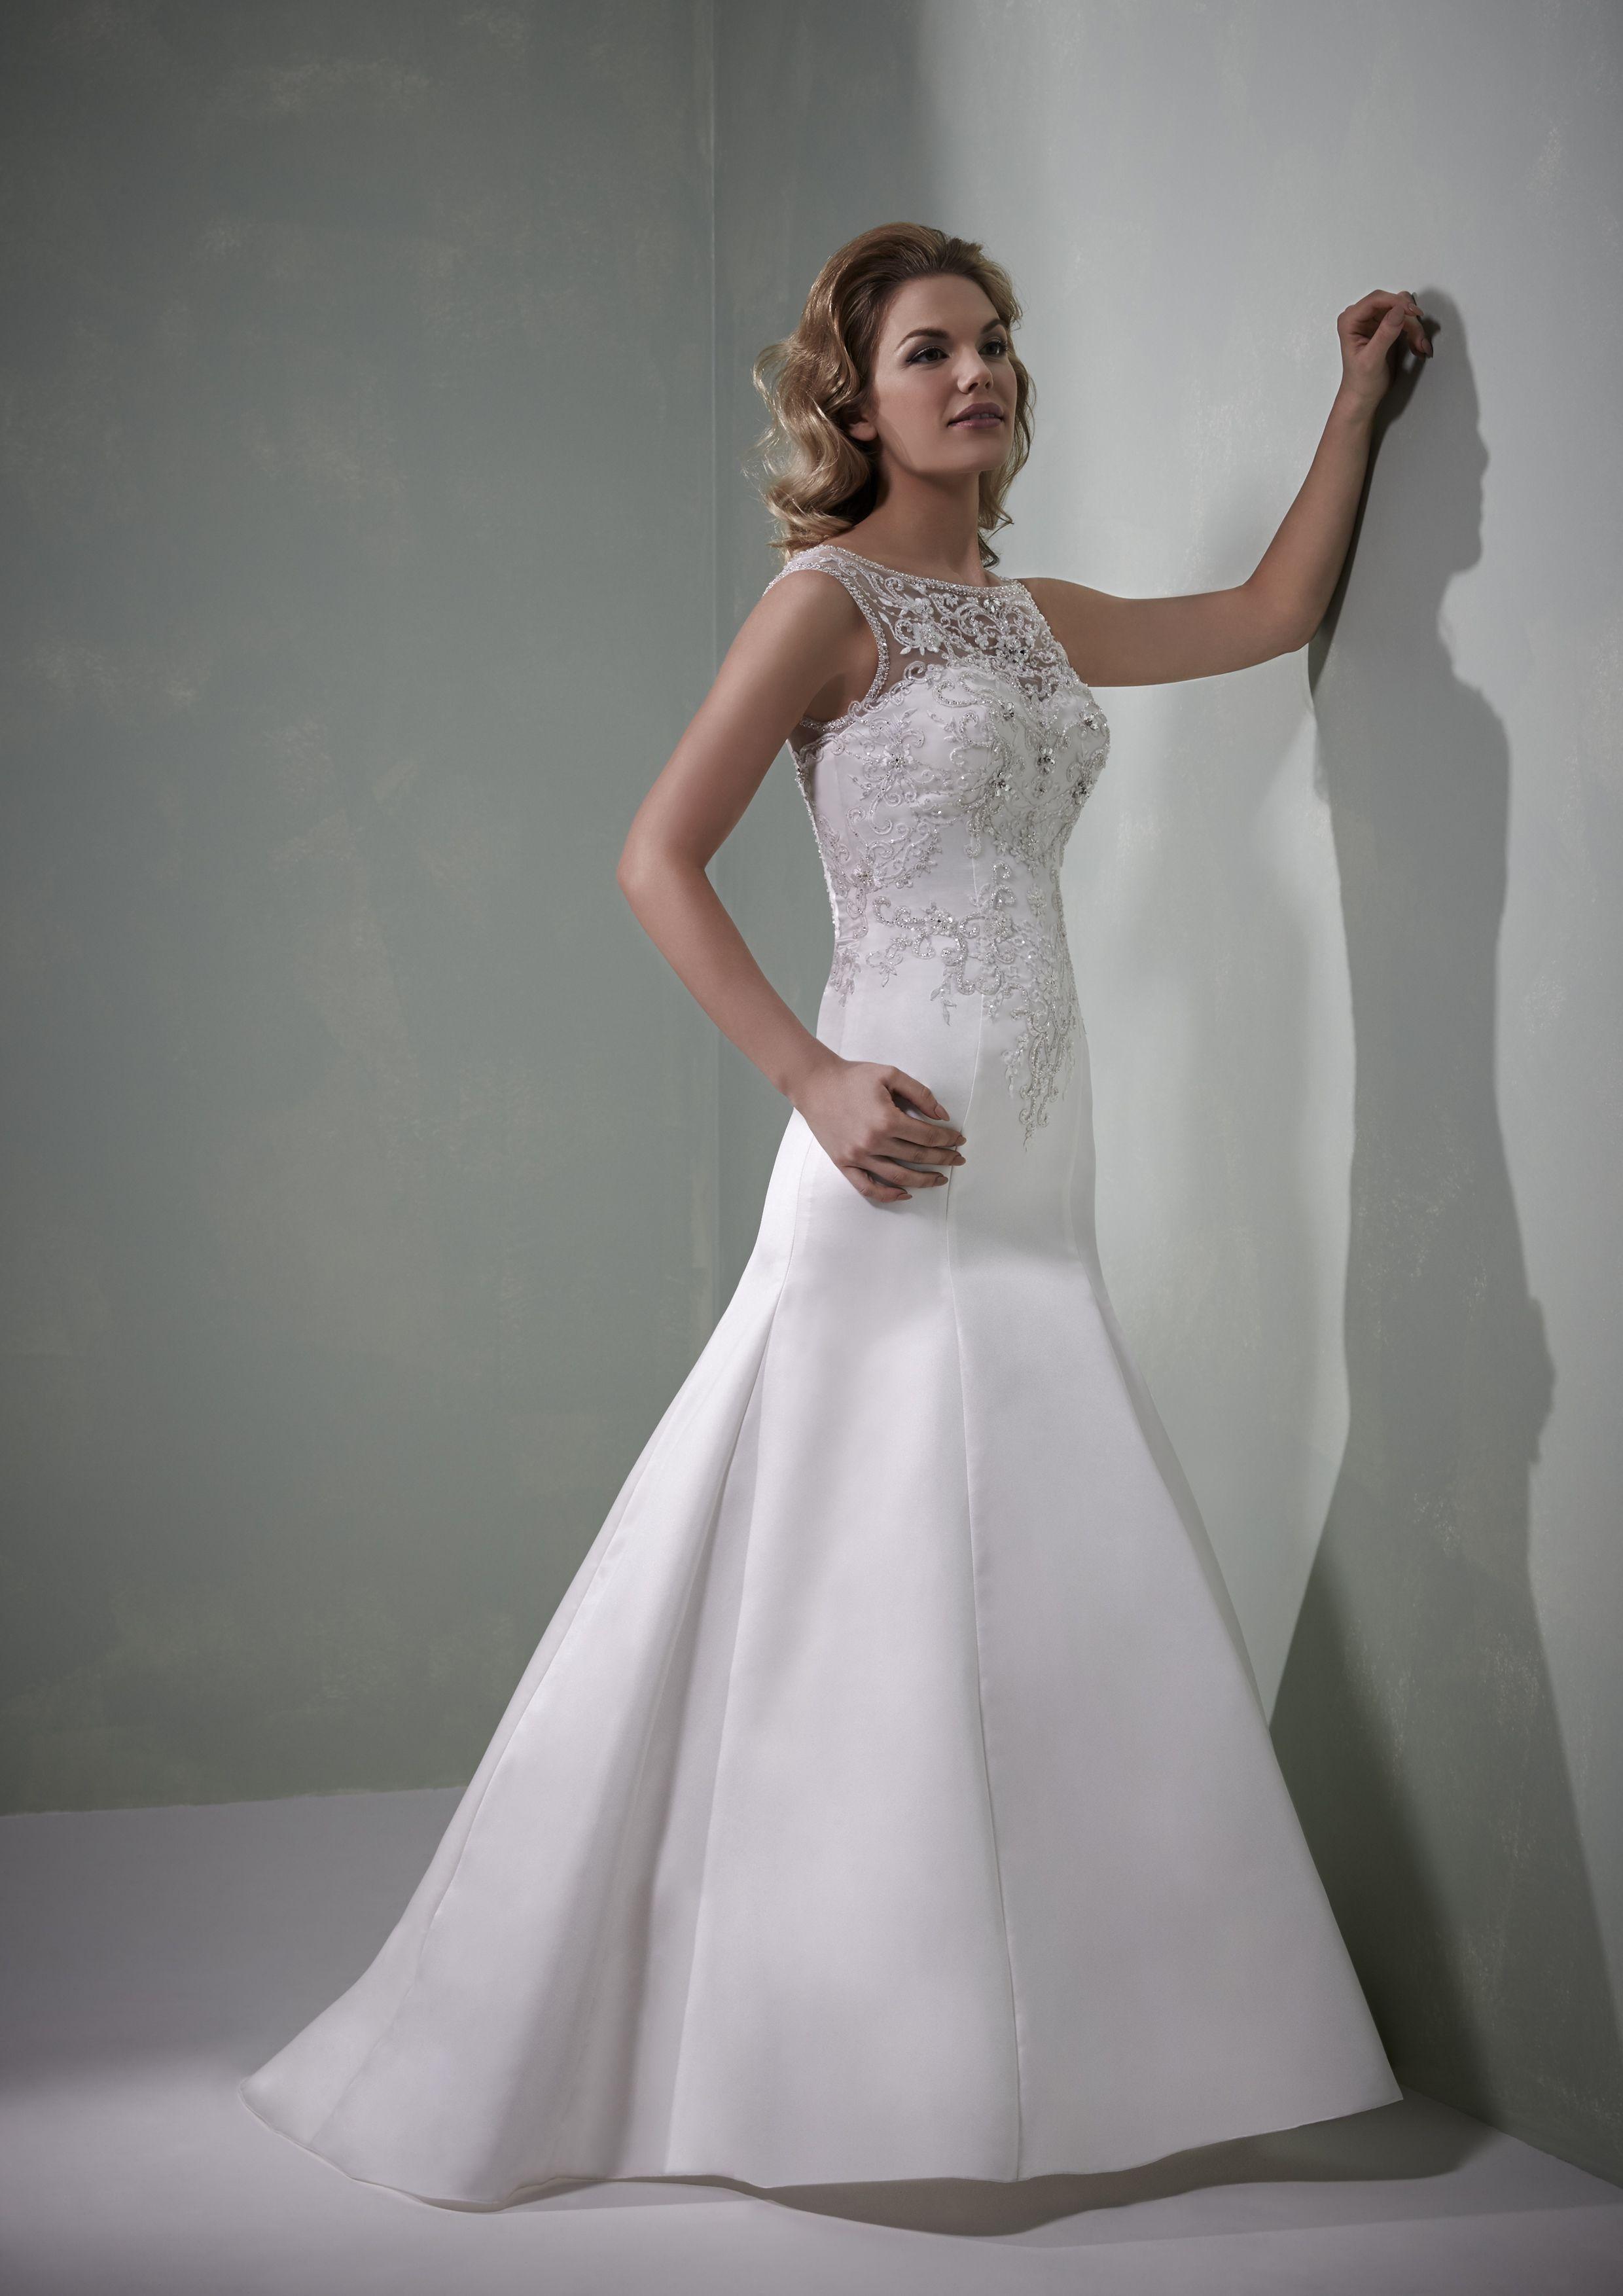 Brooke ivory or white, zip back, a fishtail wedding